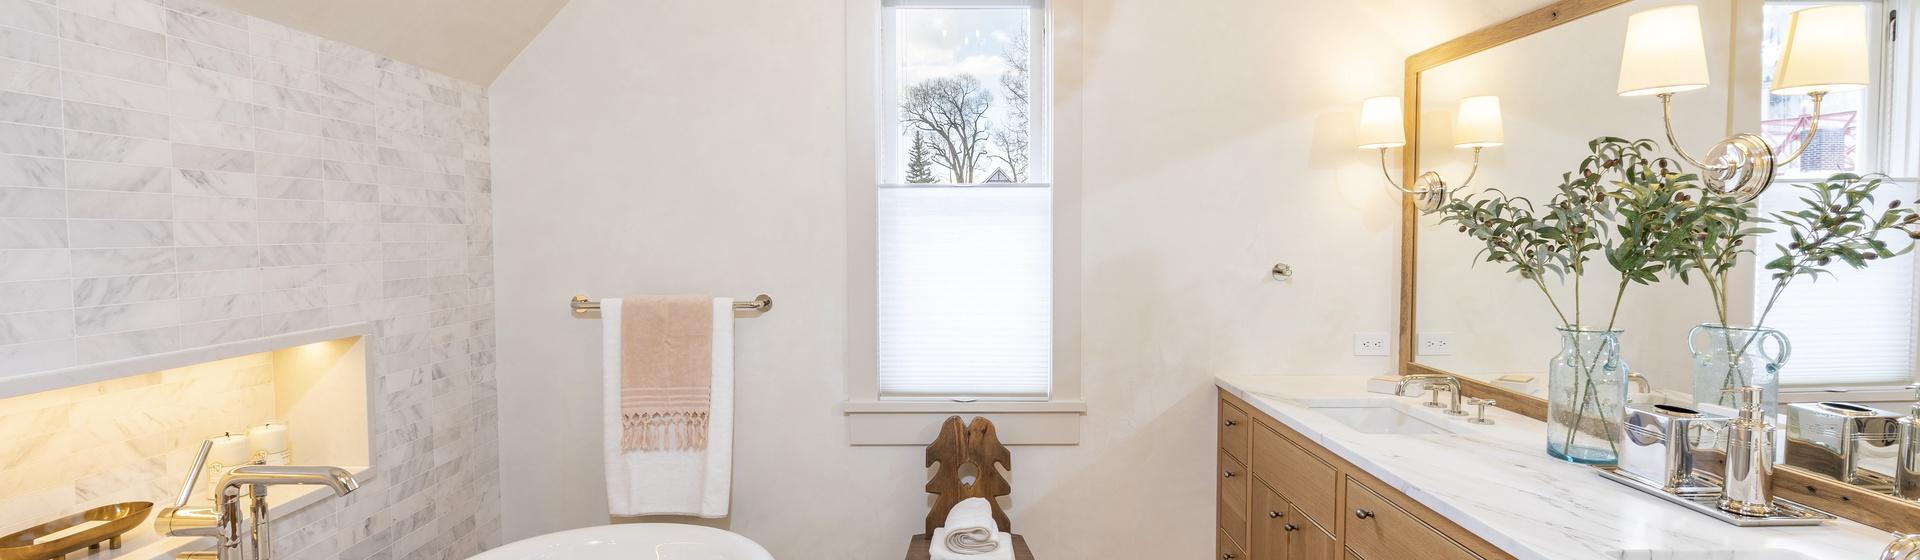 1.23-telluride-the-lighthouse-master-bathroom